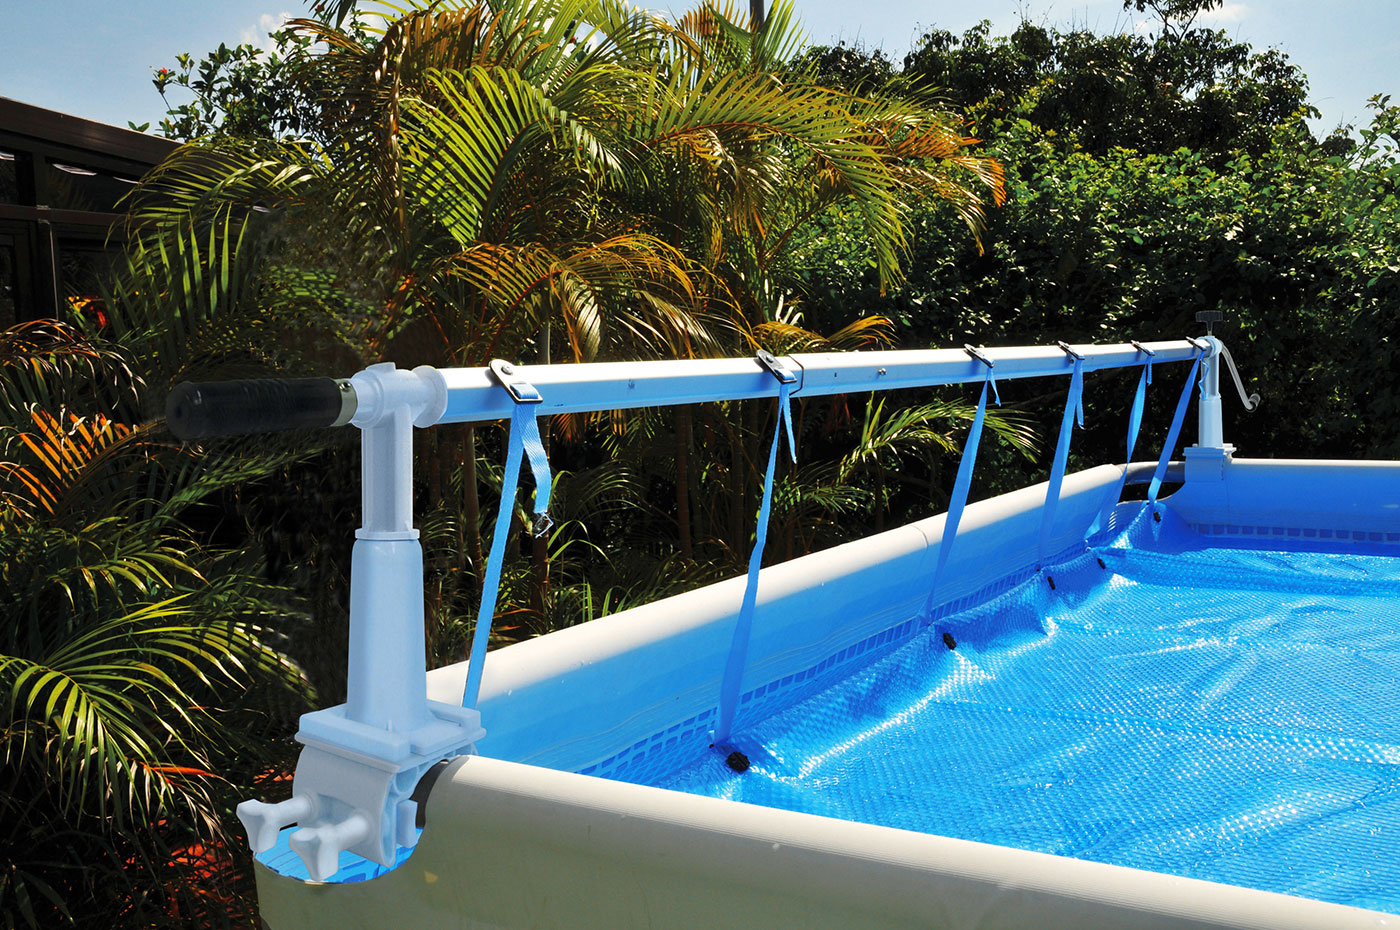 Intex Pools round solaris kokido above ground cover solar reel for intex pools